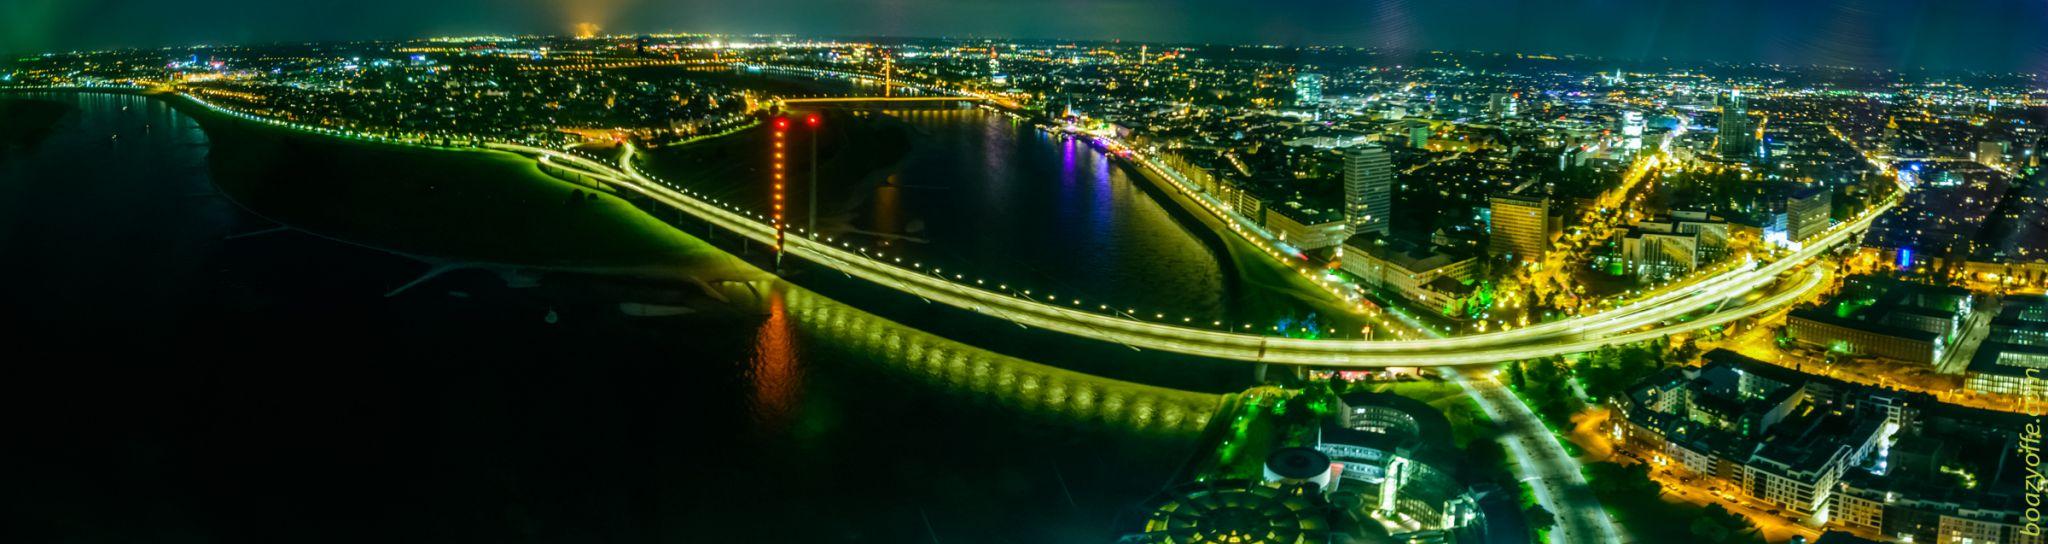 Panoramic View of Rheinkniebrücke, Bridge on the Rhine, Germany